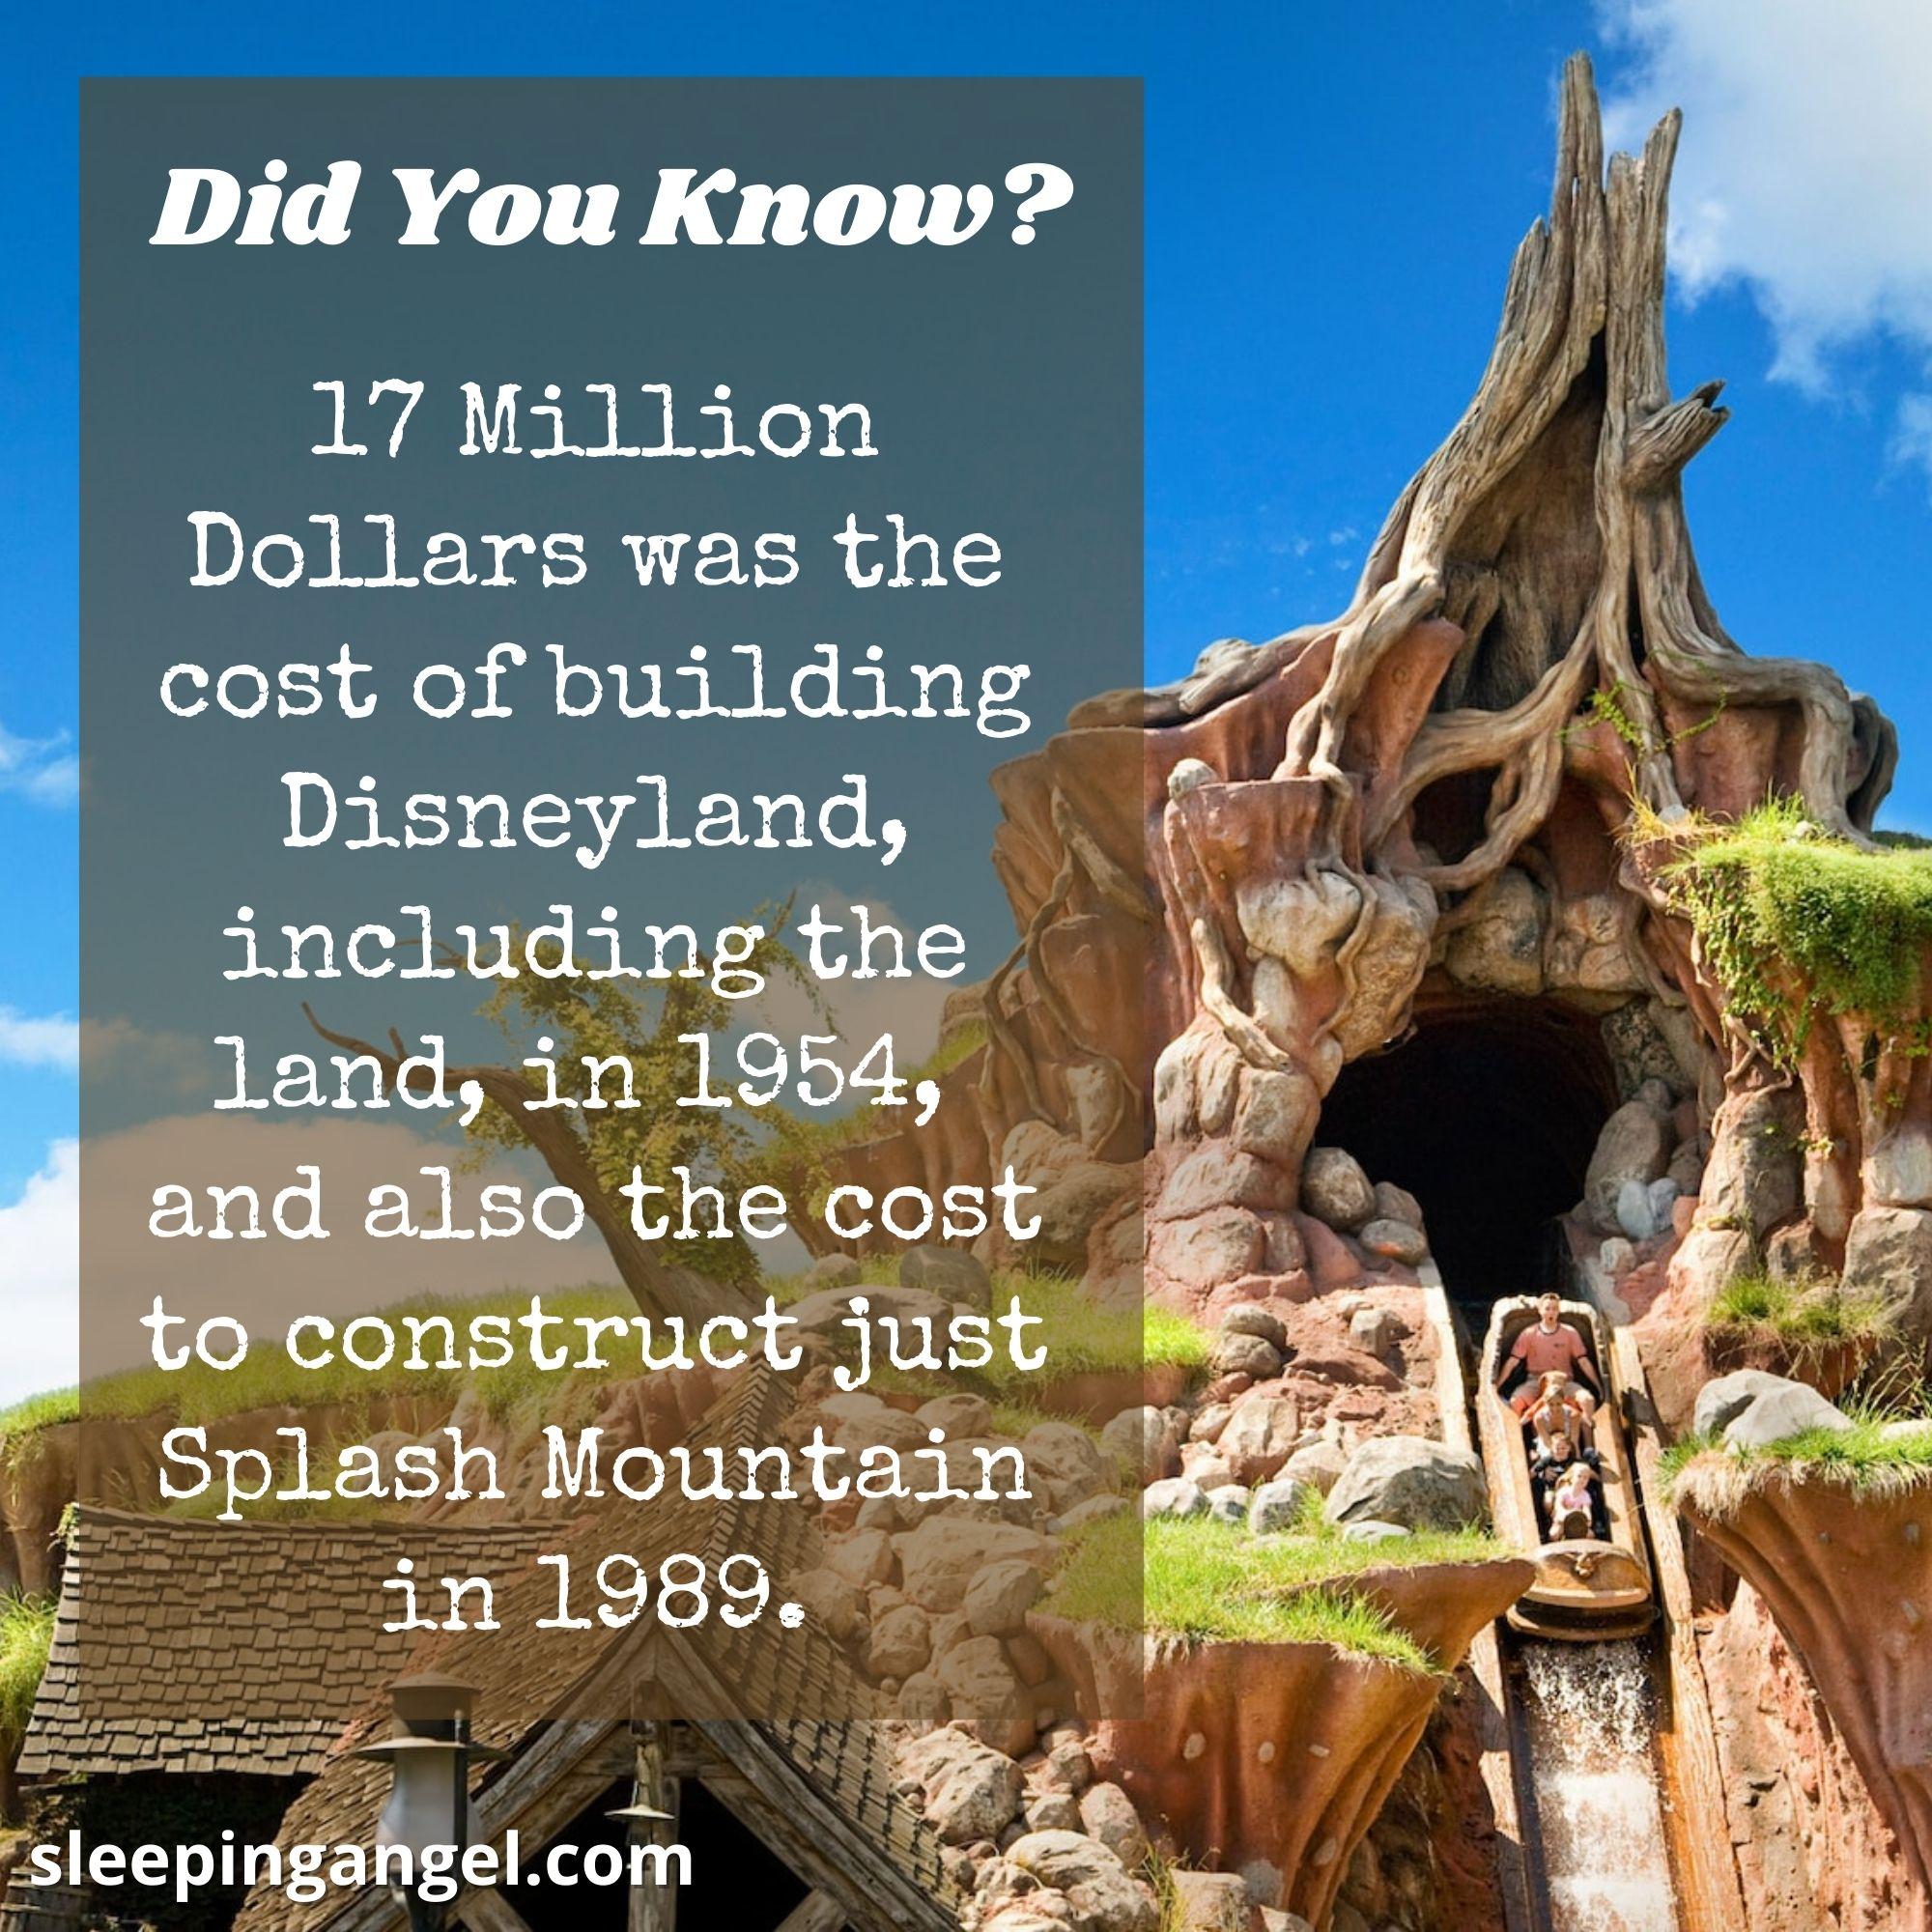 Did You Know? Splash Mountain